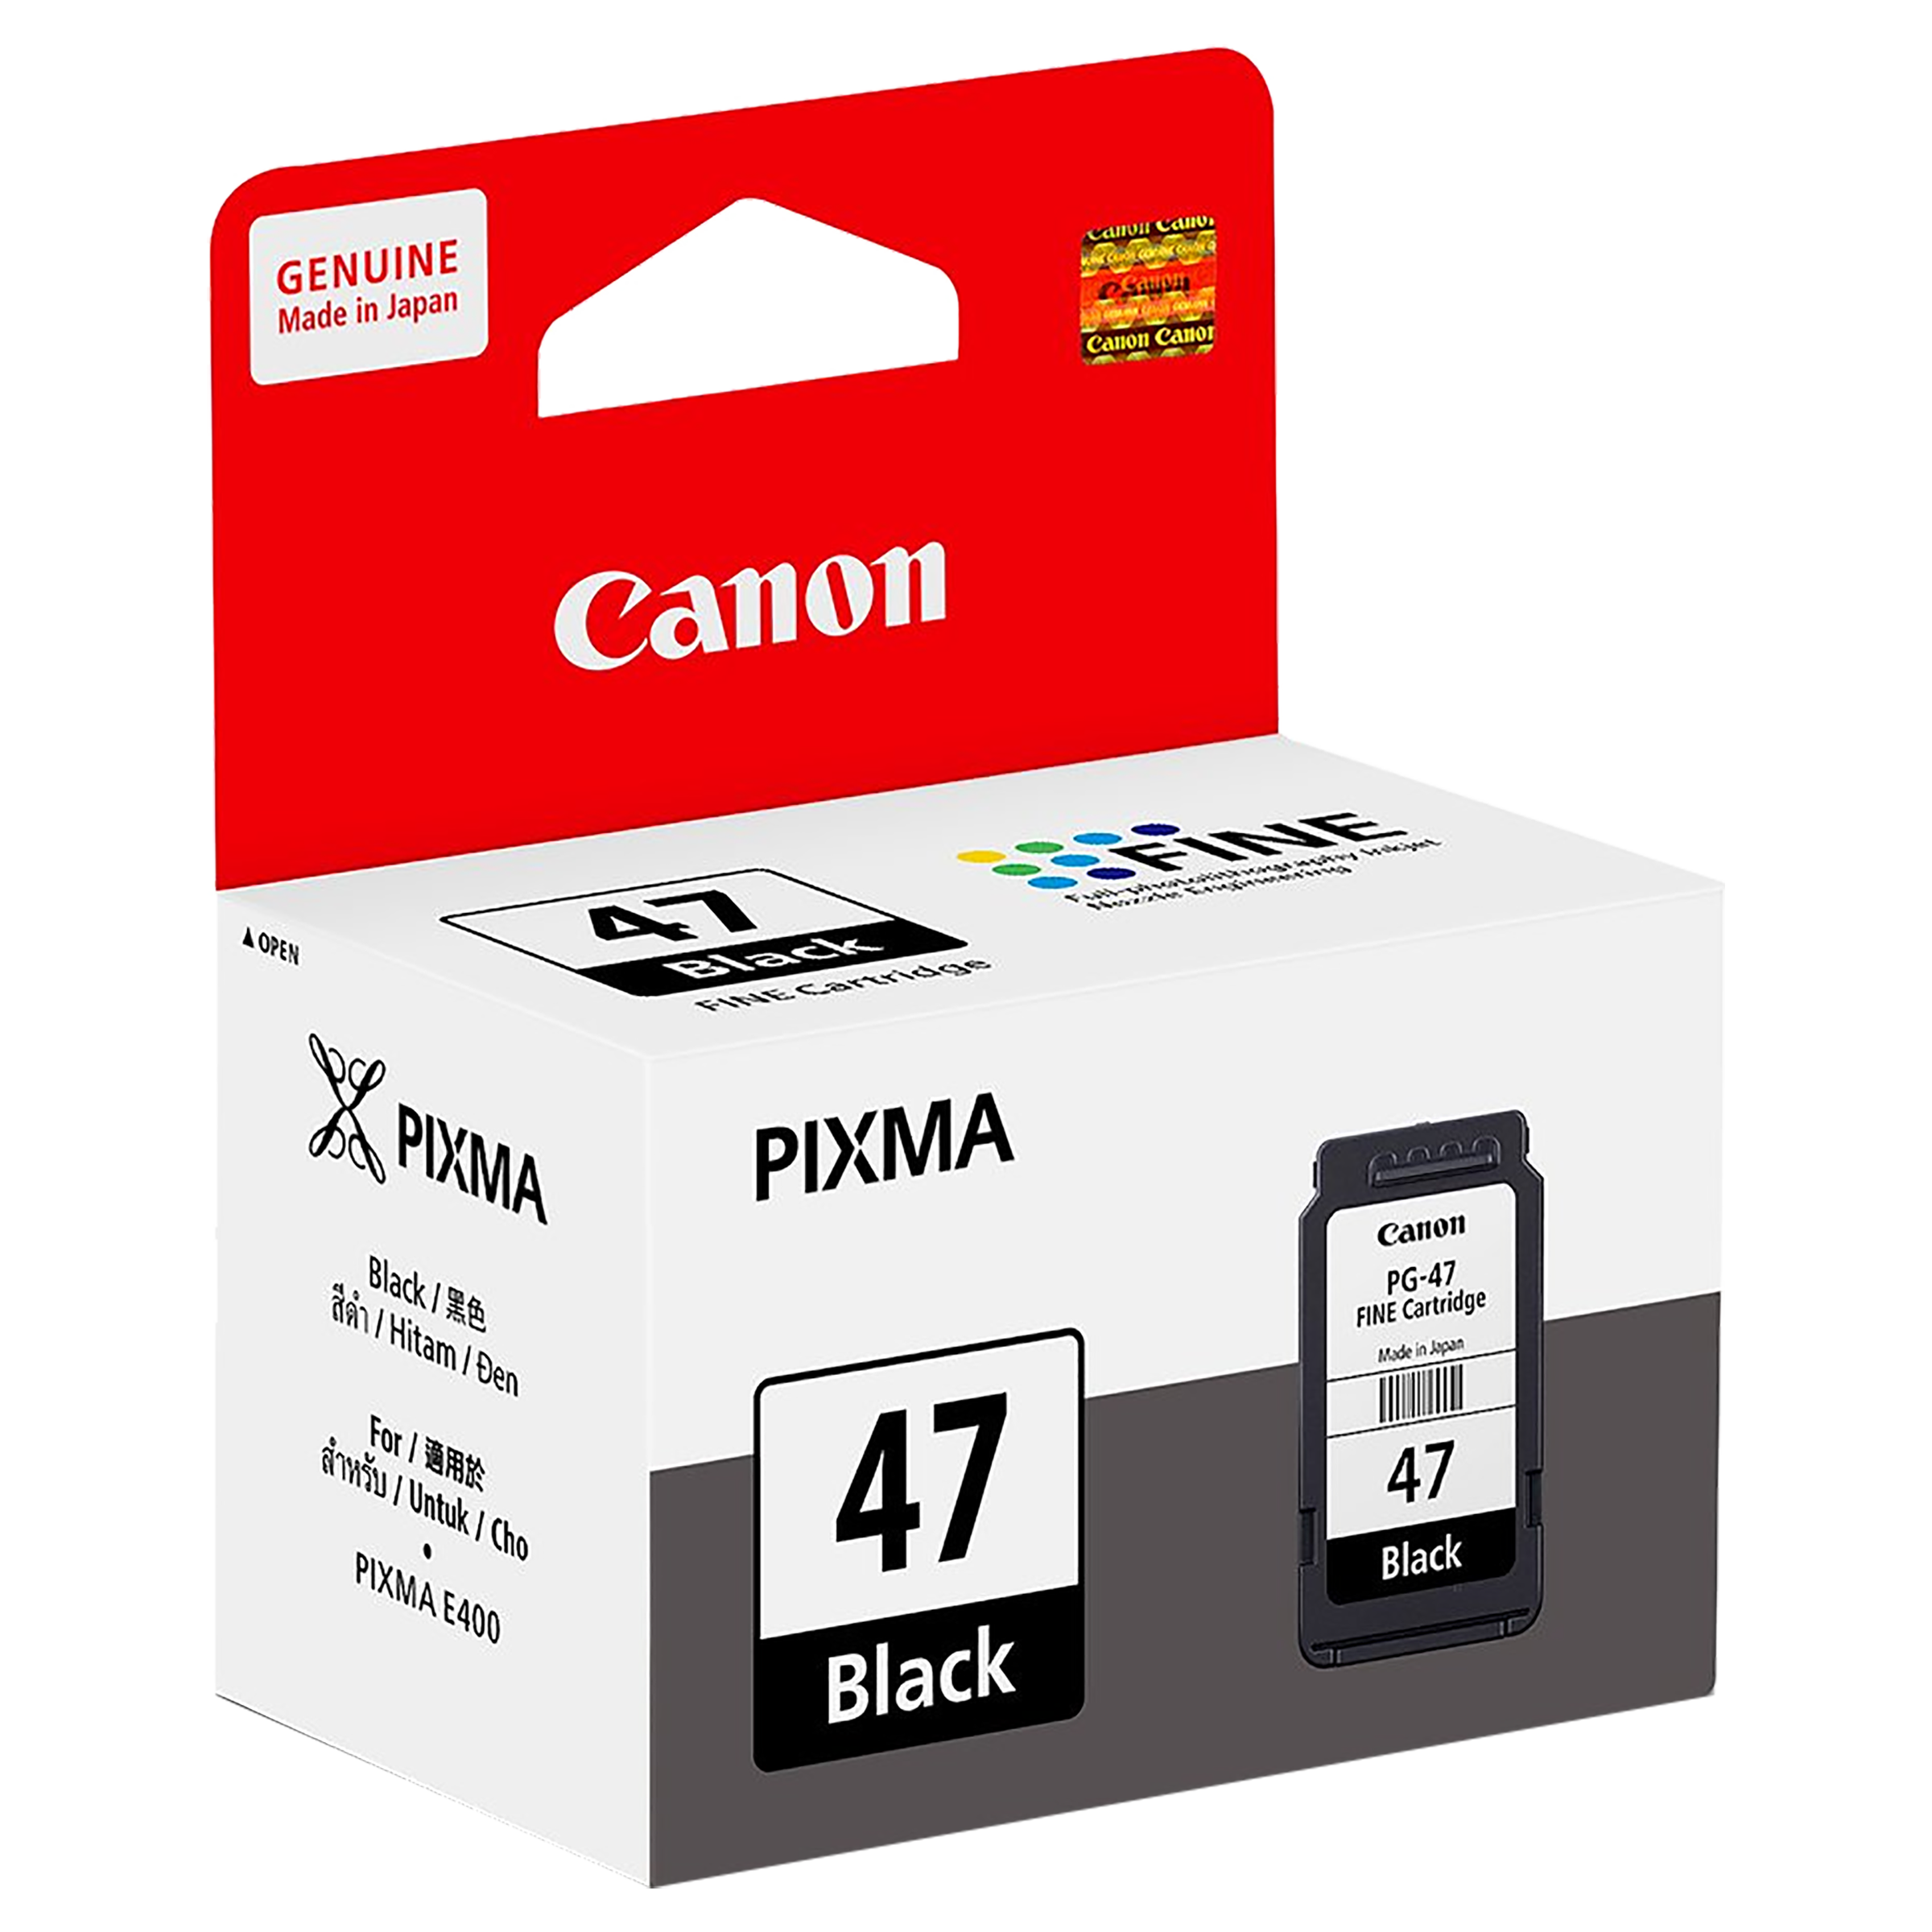 Canon Pixma PG-47 Ink Cartridge (9057B005AE, Black)_1